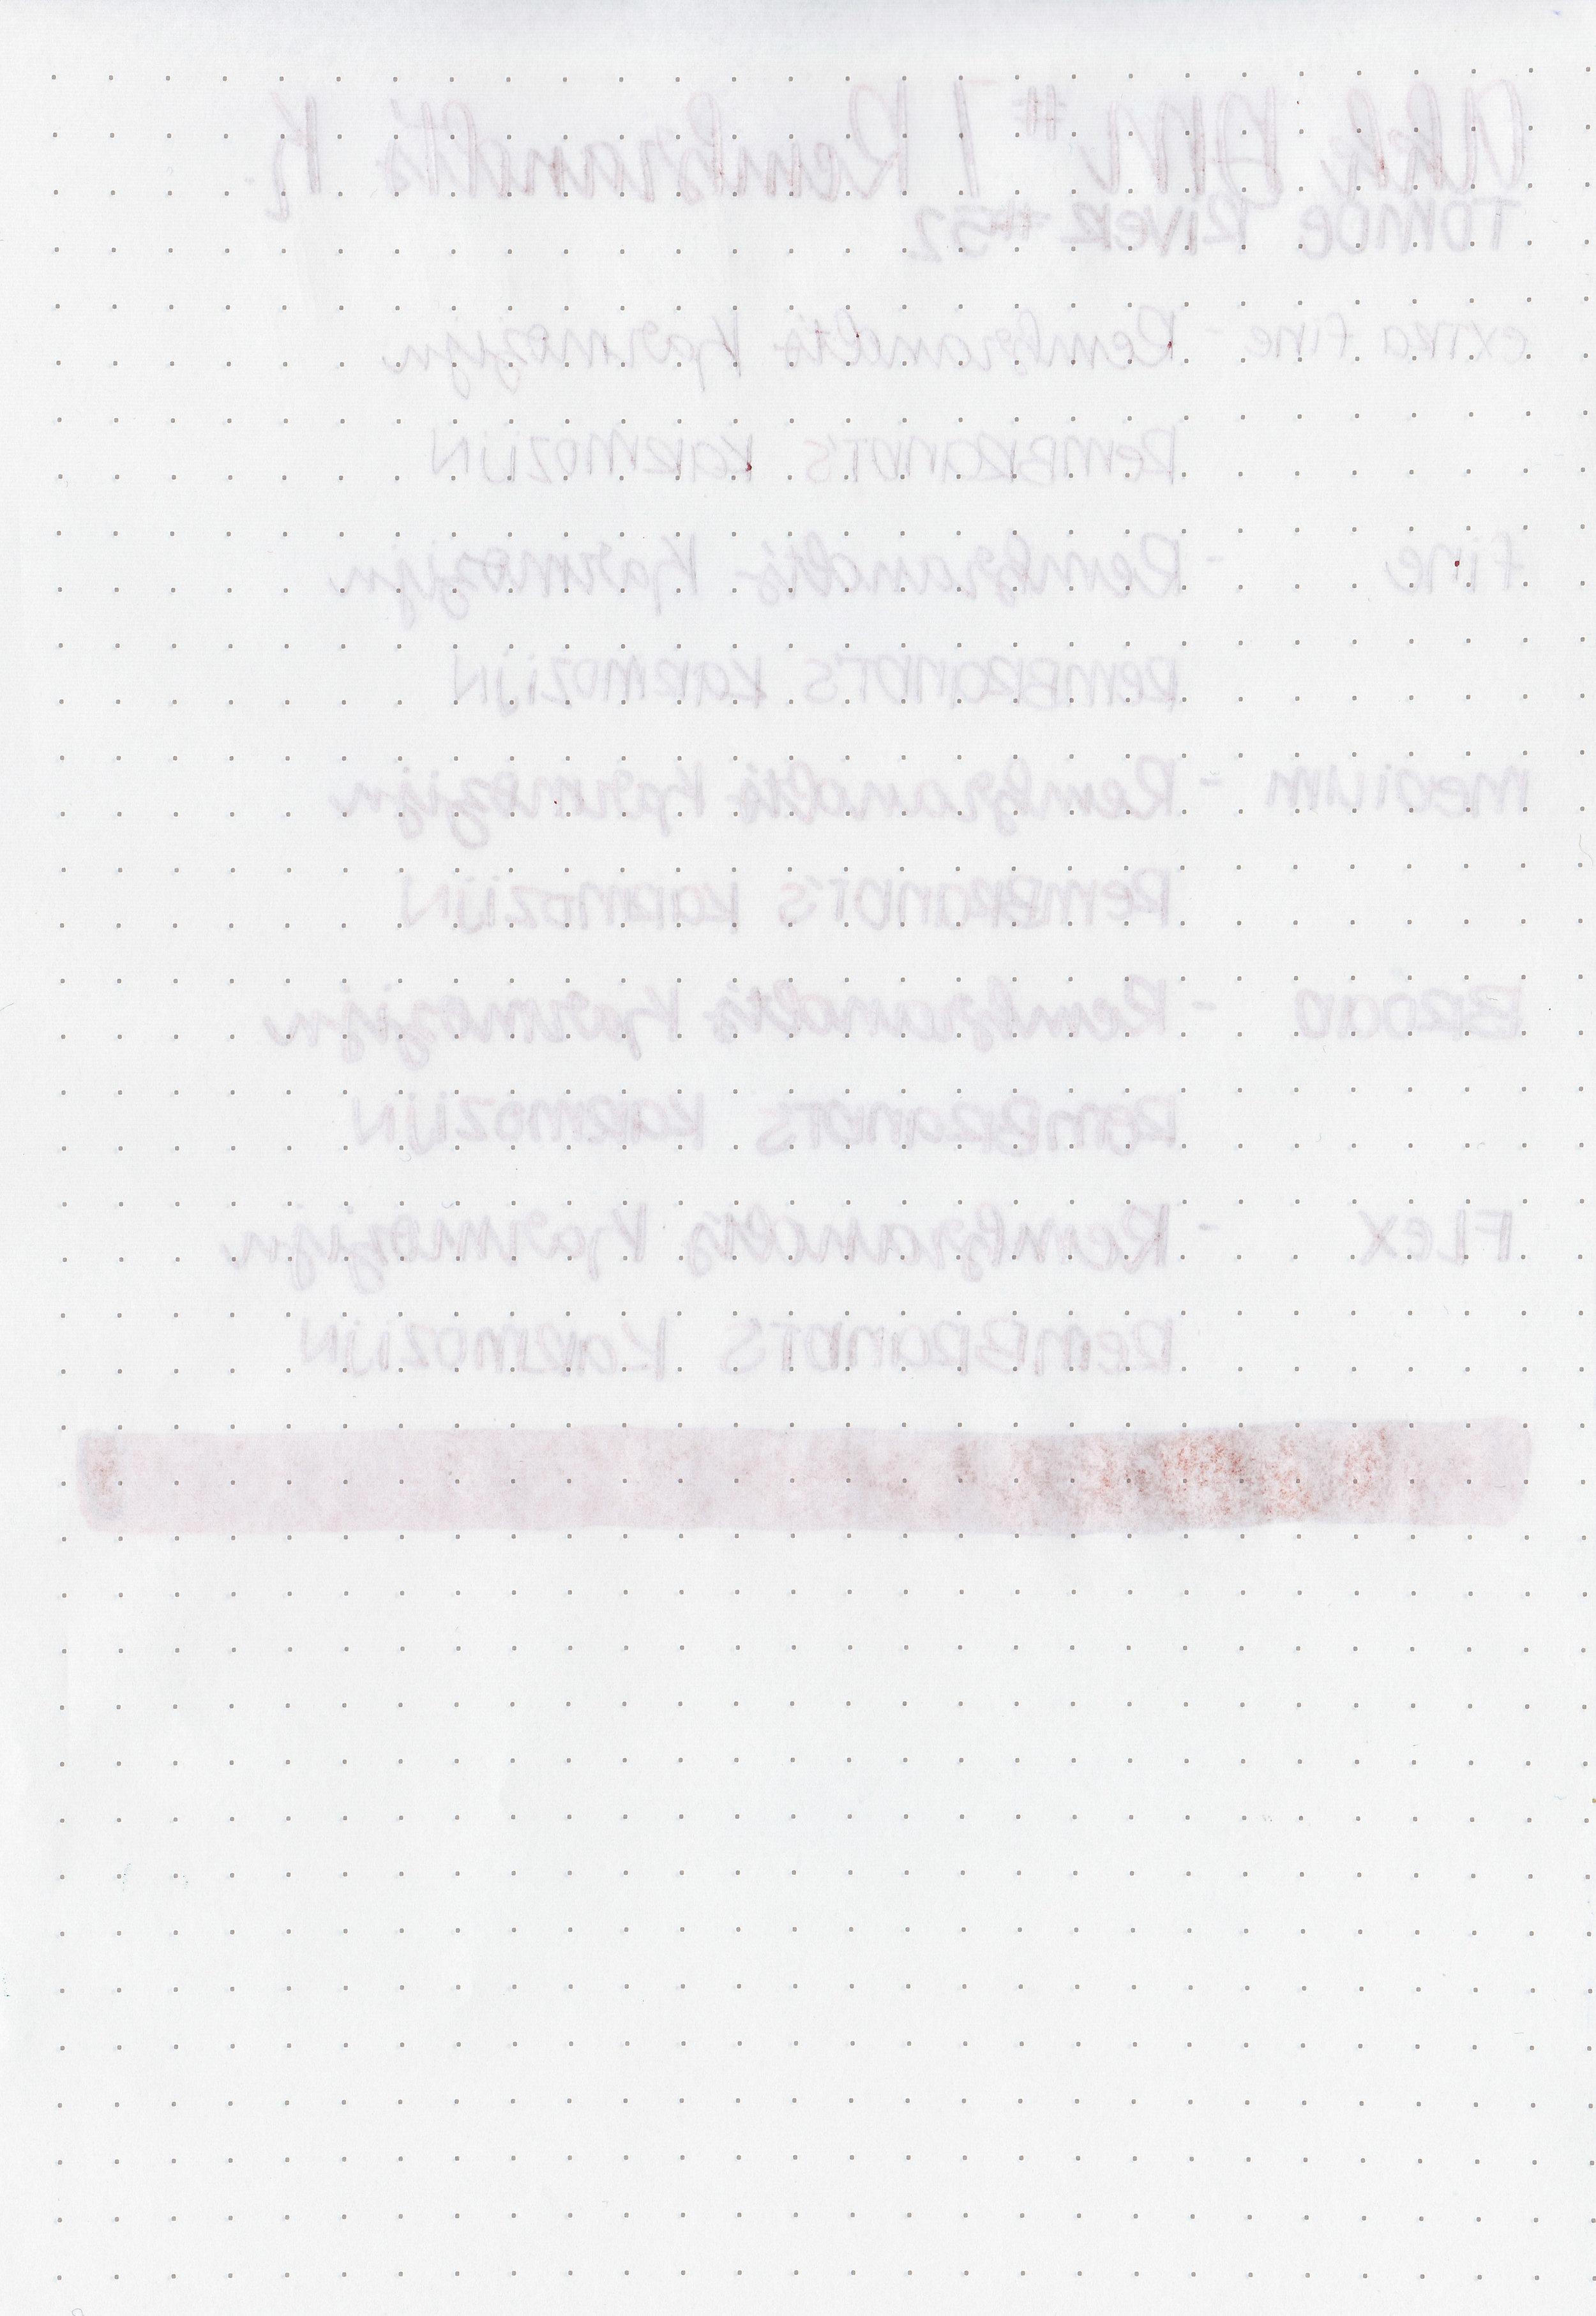 akk-7-rembrandt-6.jpg